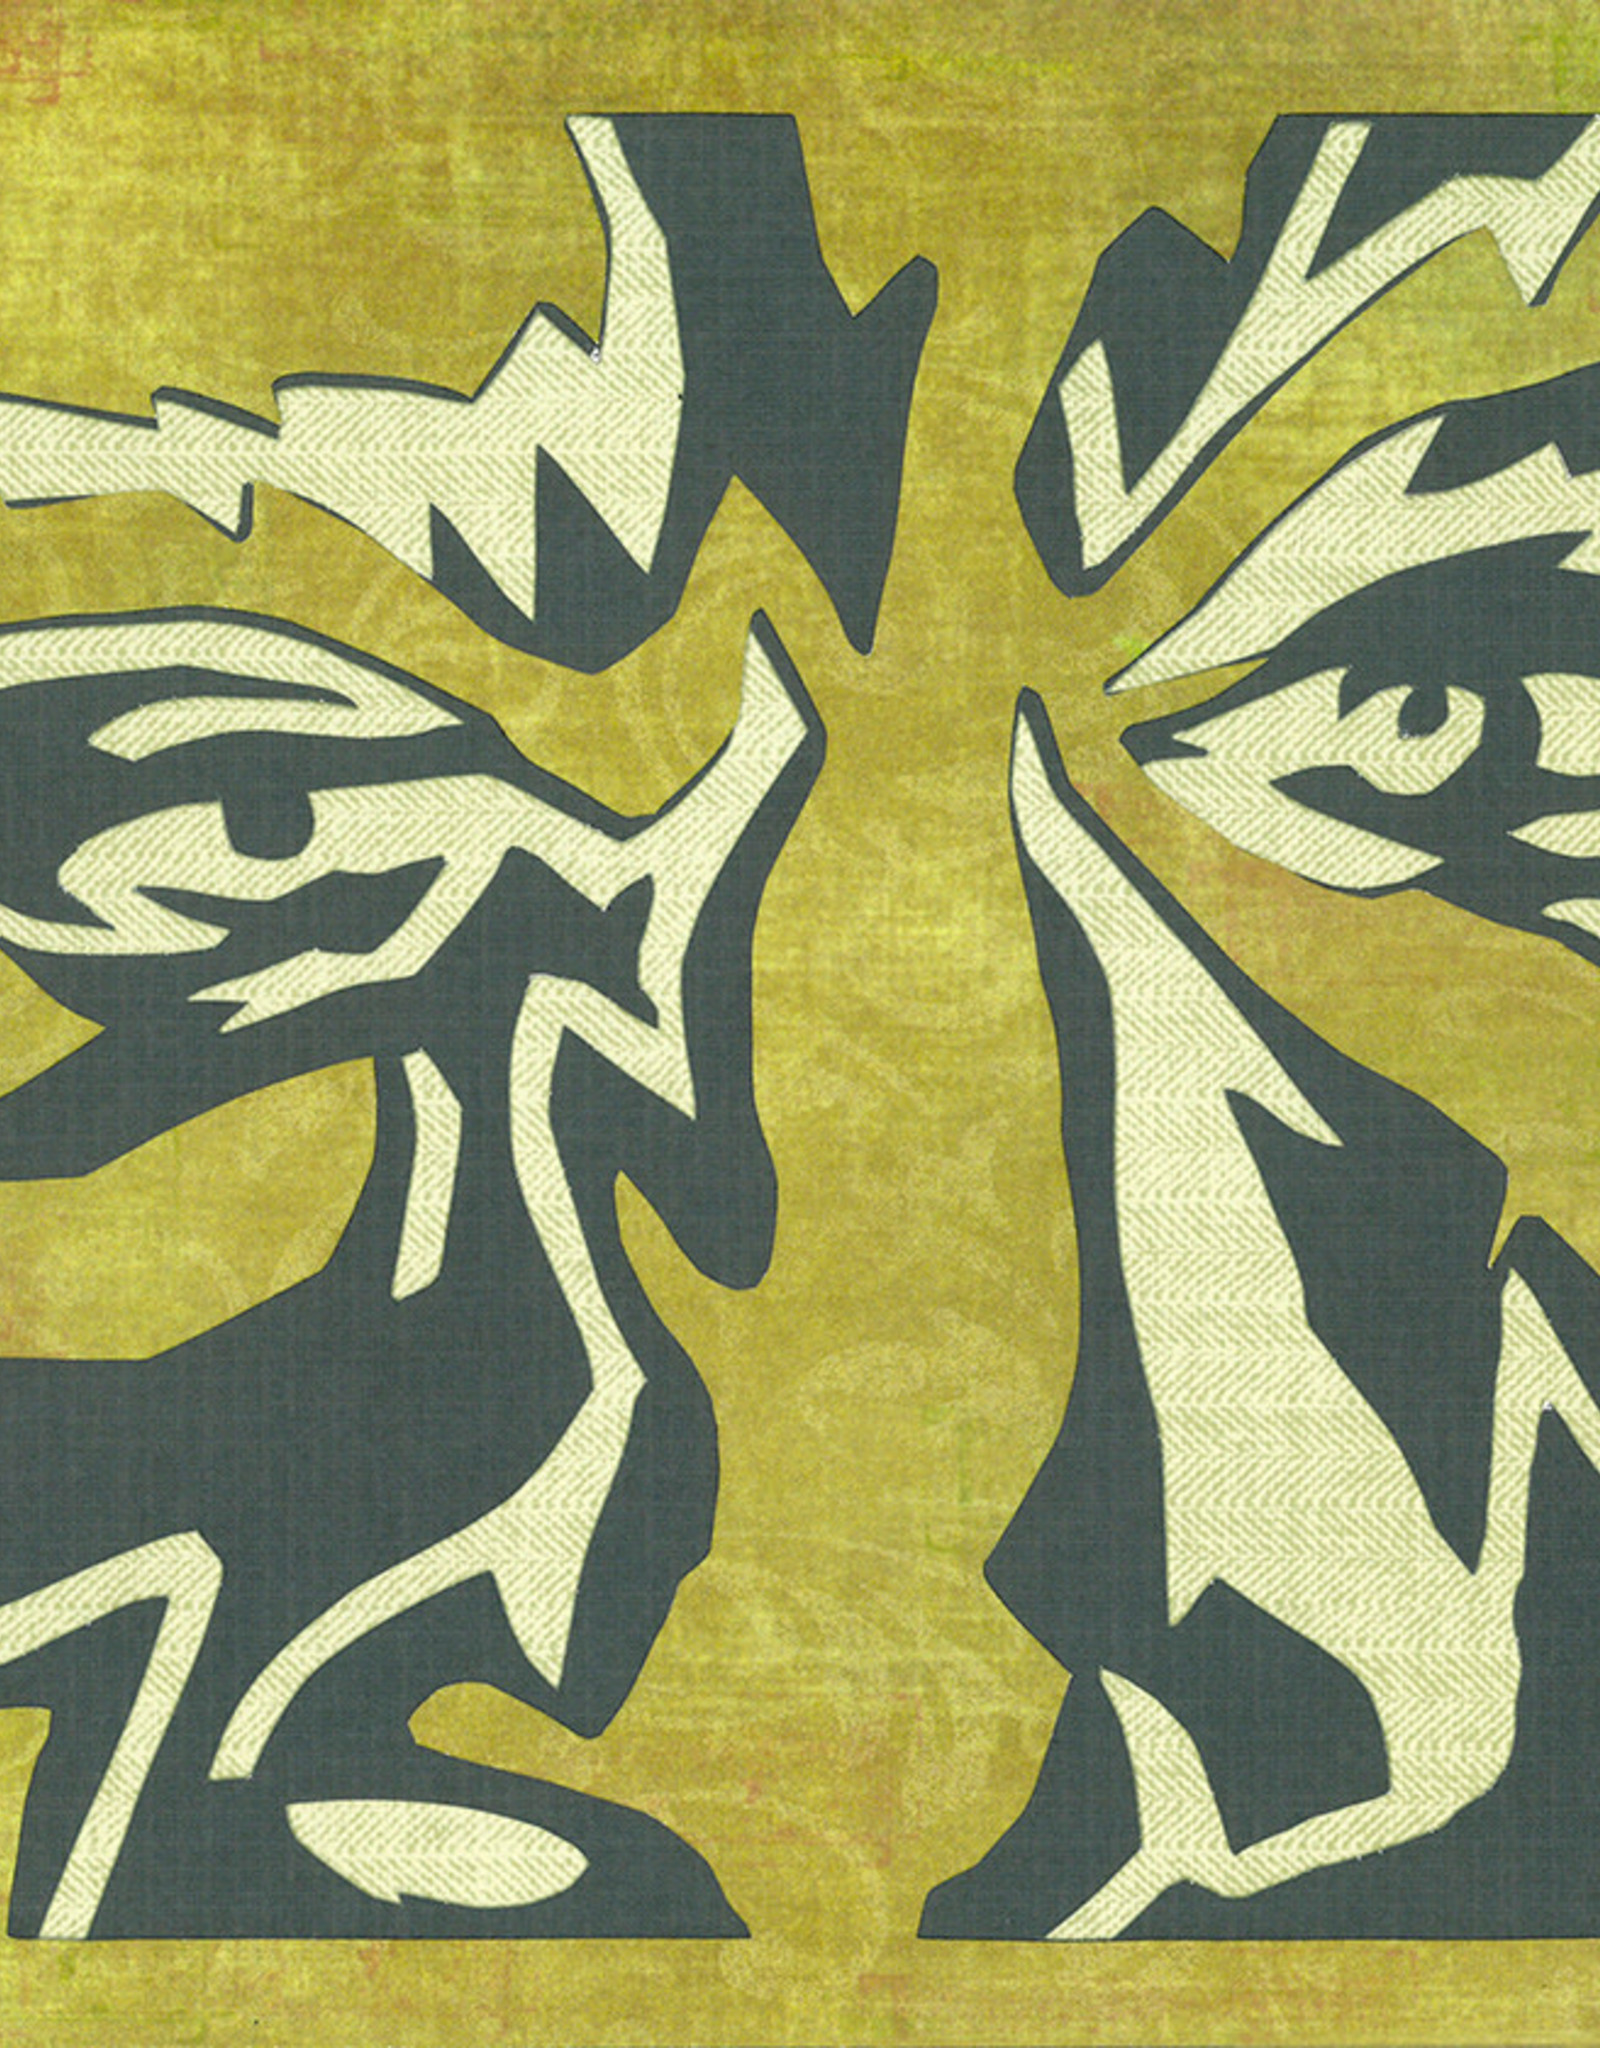 Gray Jones Face to Face -Cutout 9x12 #12